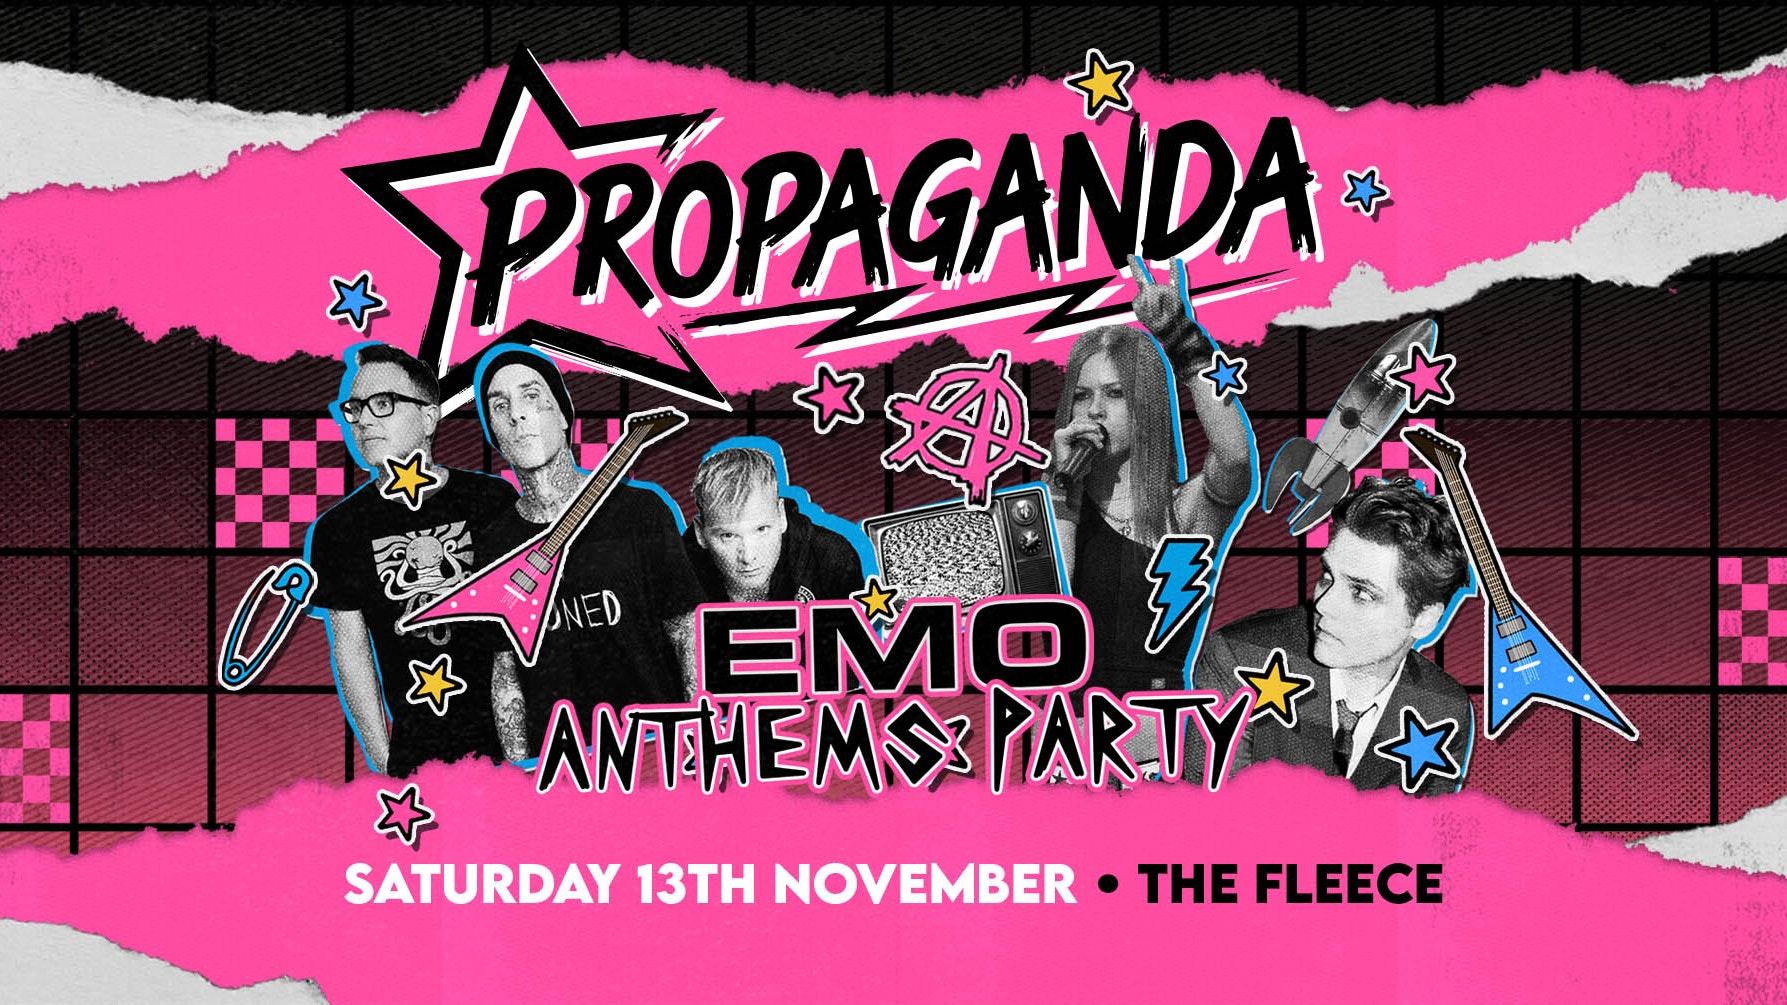 Propaganda Bristol – Emo Anthems Party!